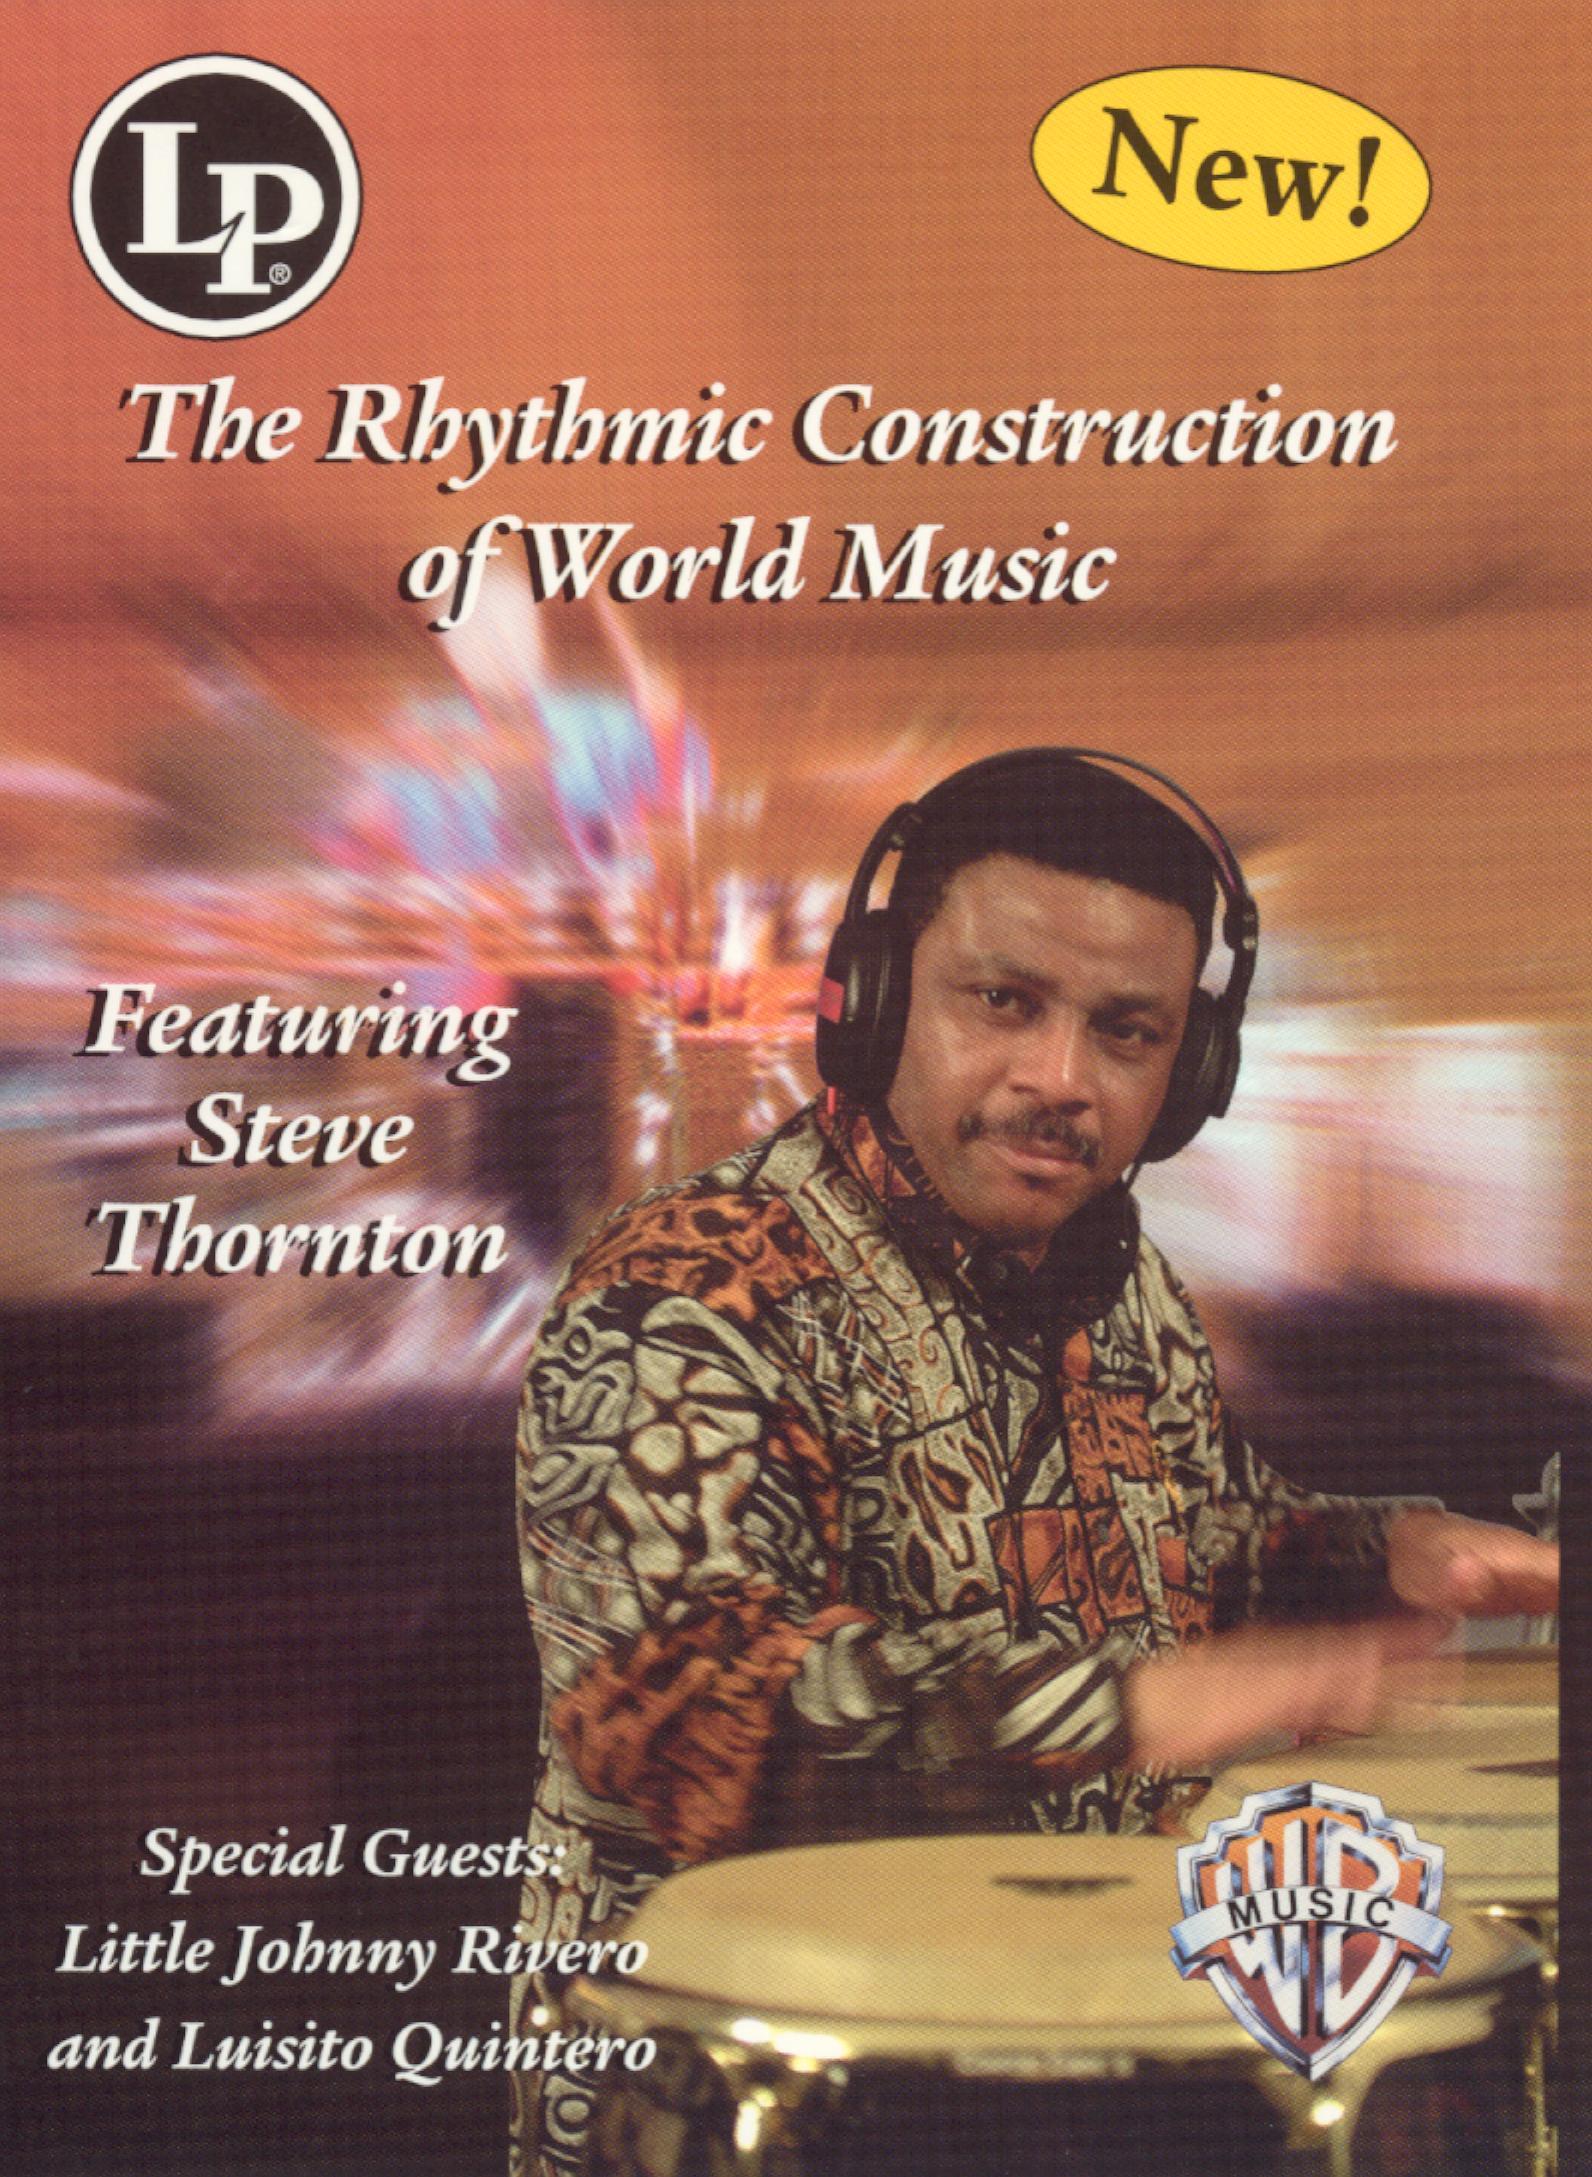 Steve Thornton: The Rhythmic Construction of World Music